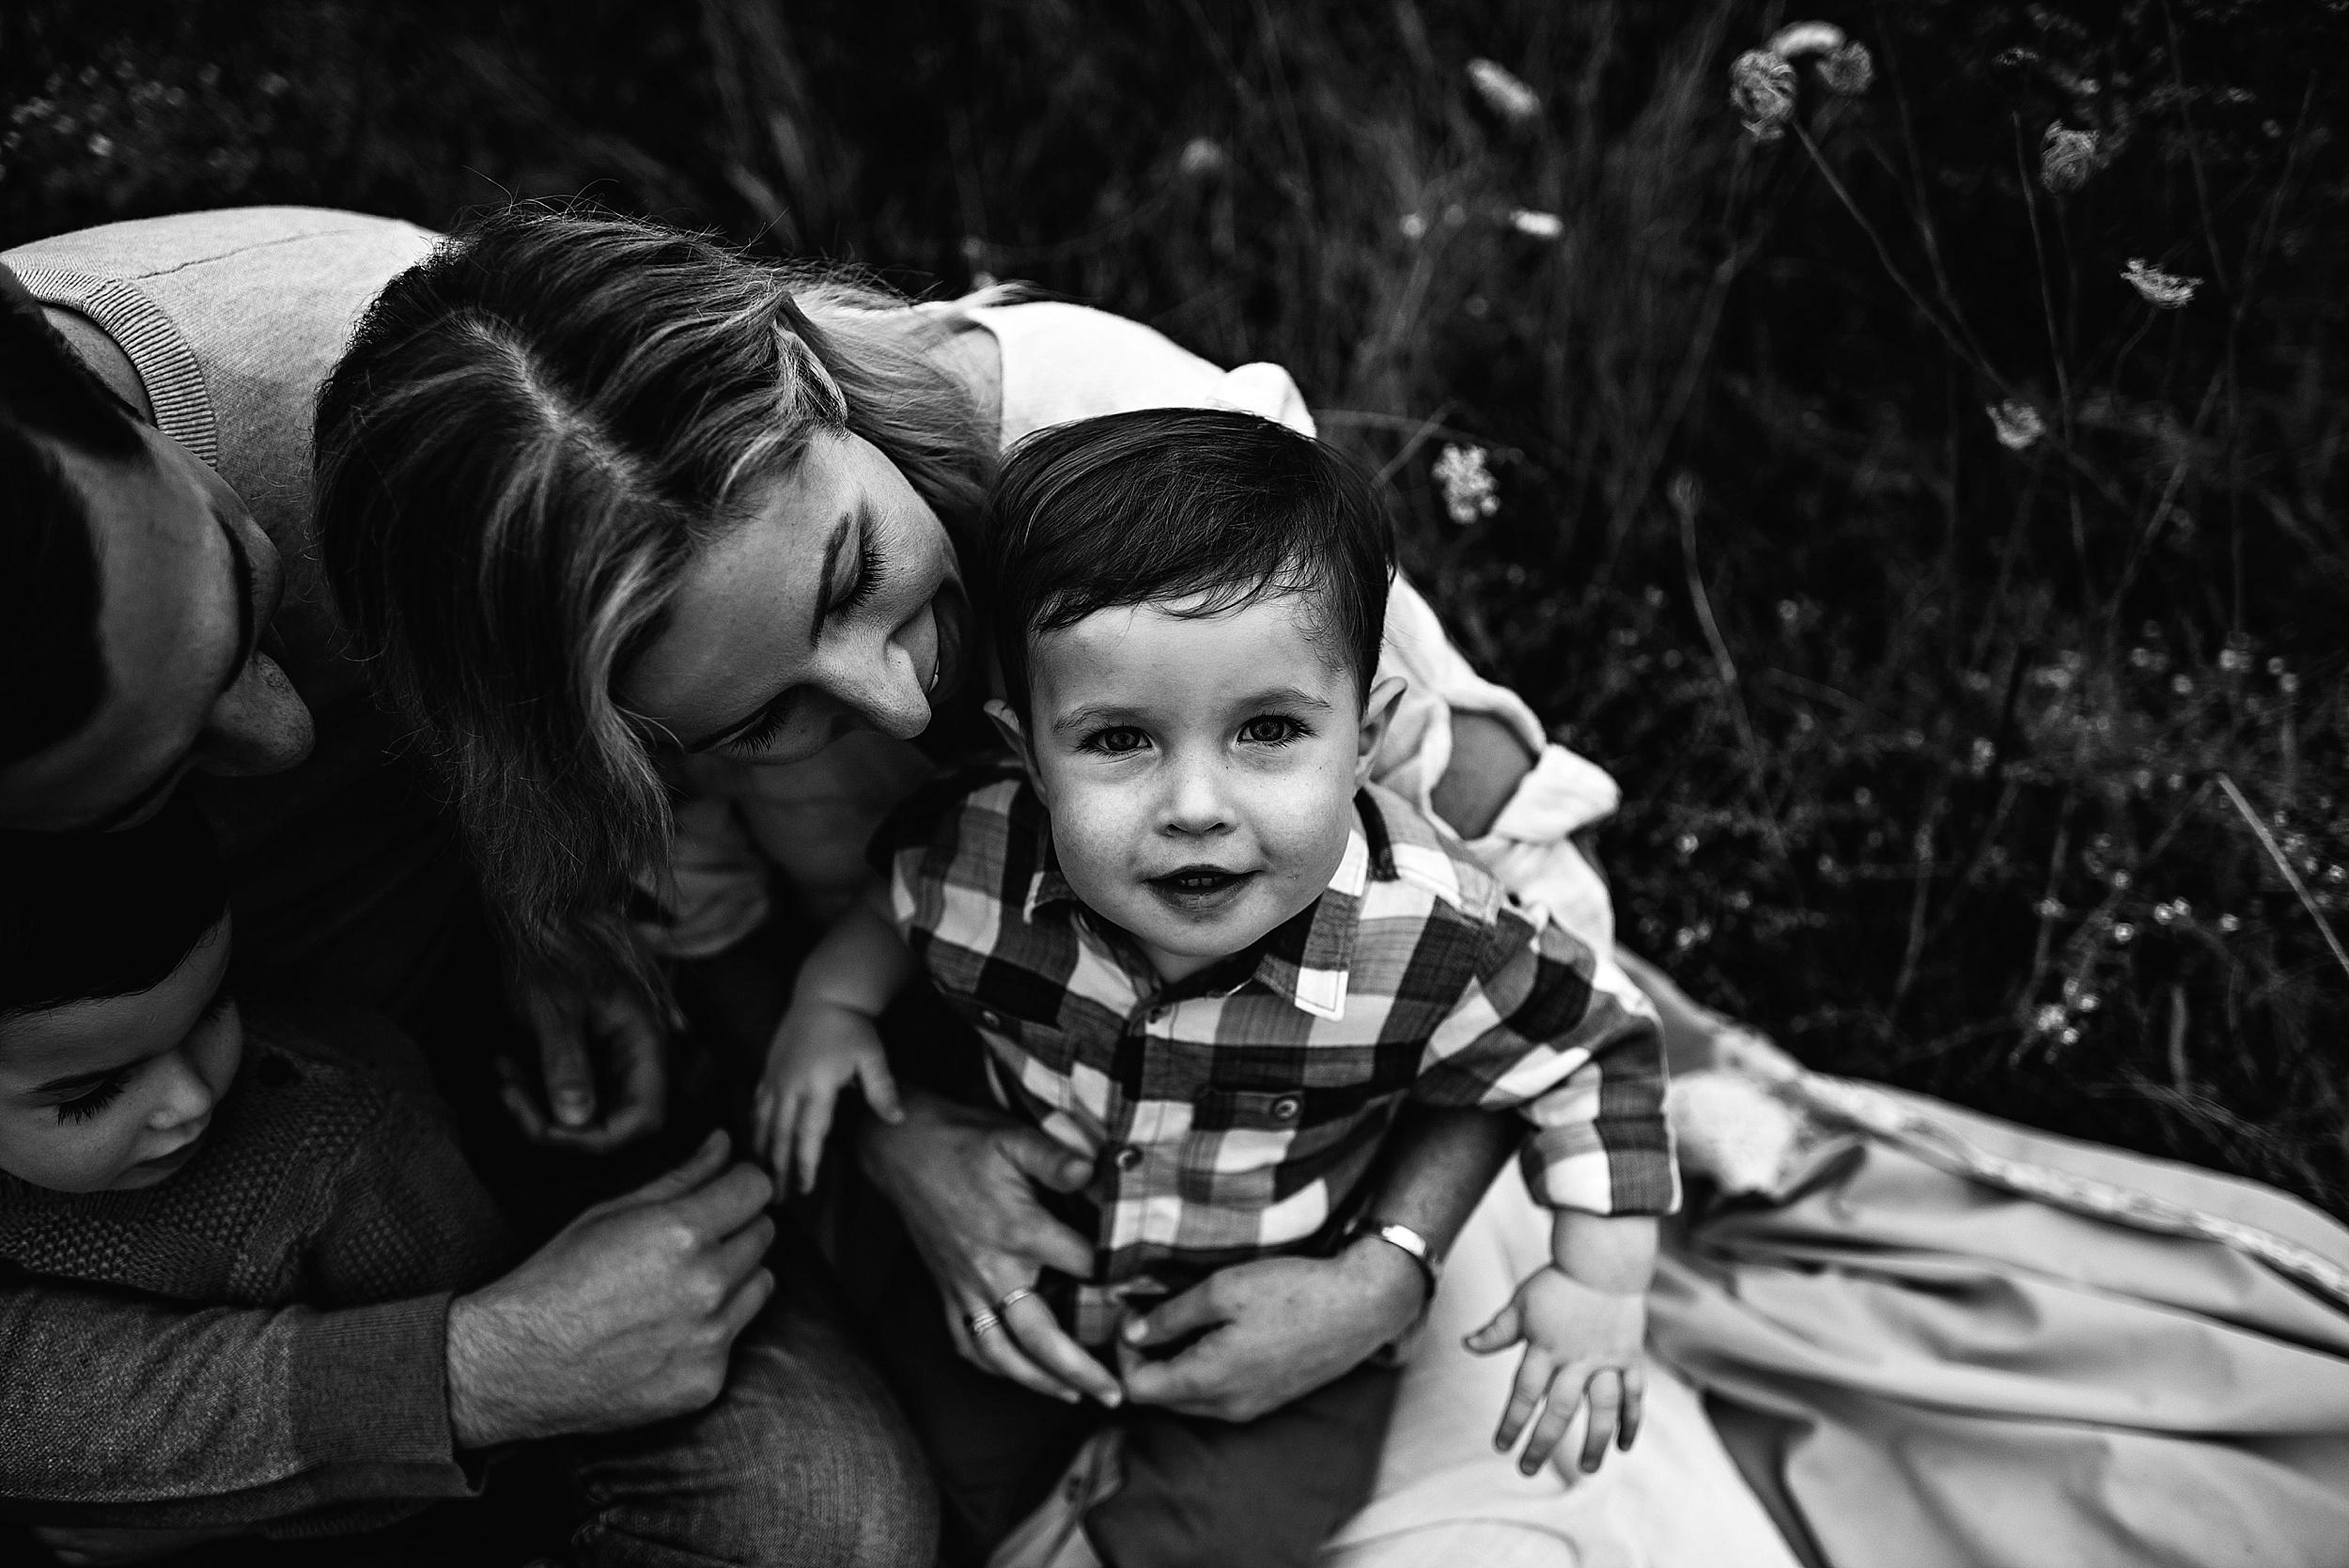 lauren-grayson-photography-portrait-artist-akron-cleveland-ohio-photographer-family-session-fields-sunset-fall_0189.jpg